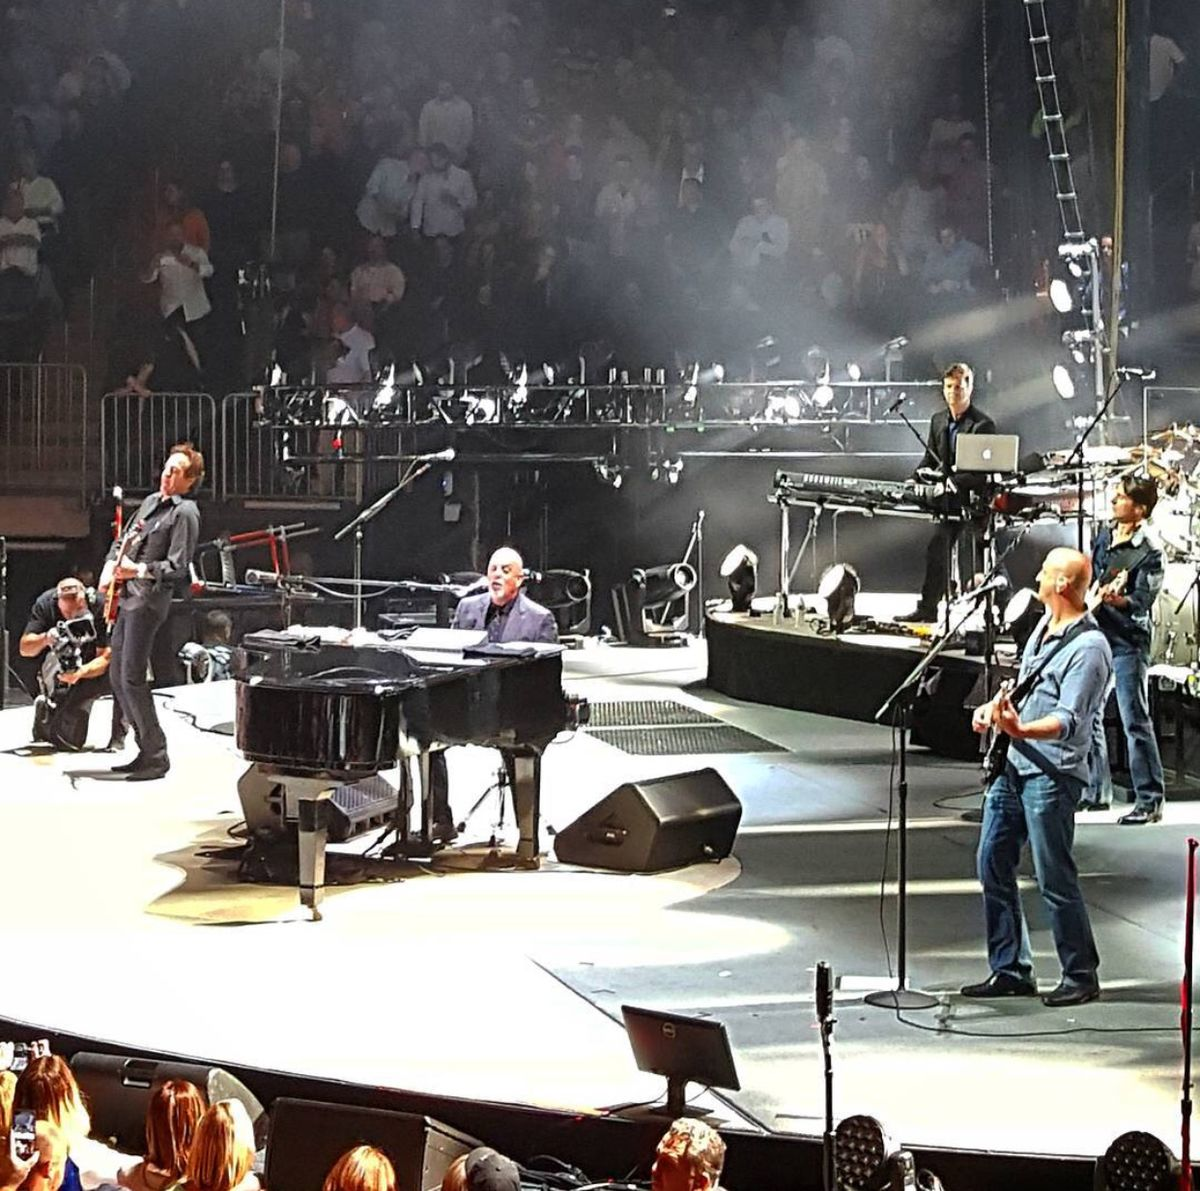 Banded Bands: Billy Joel Band